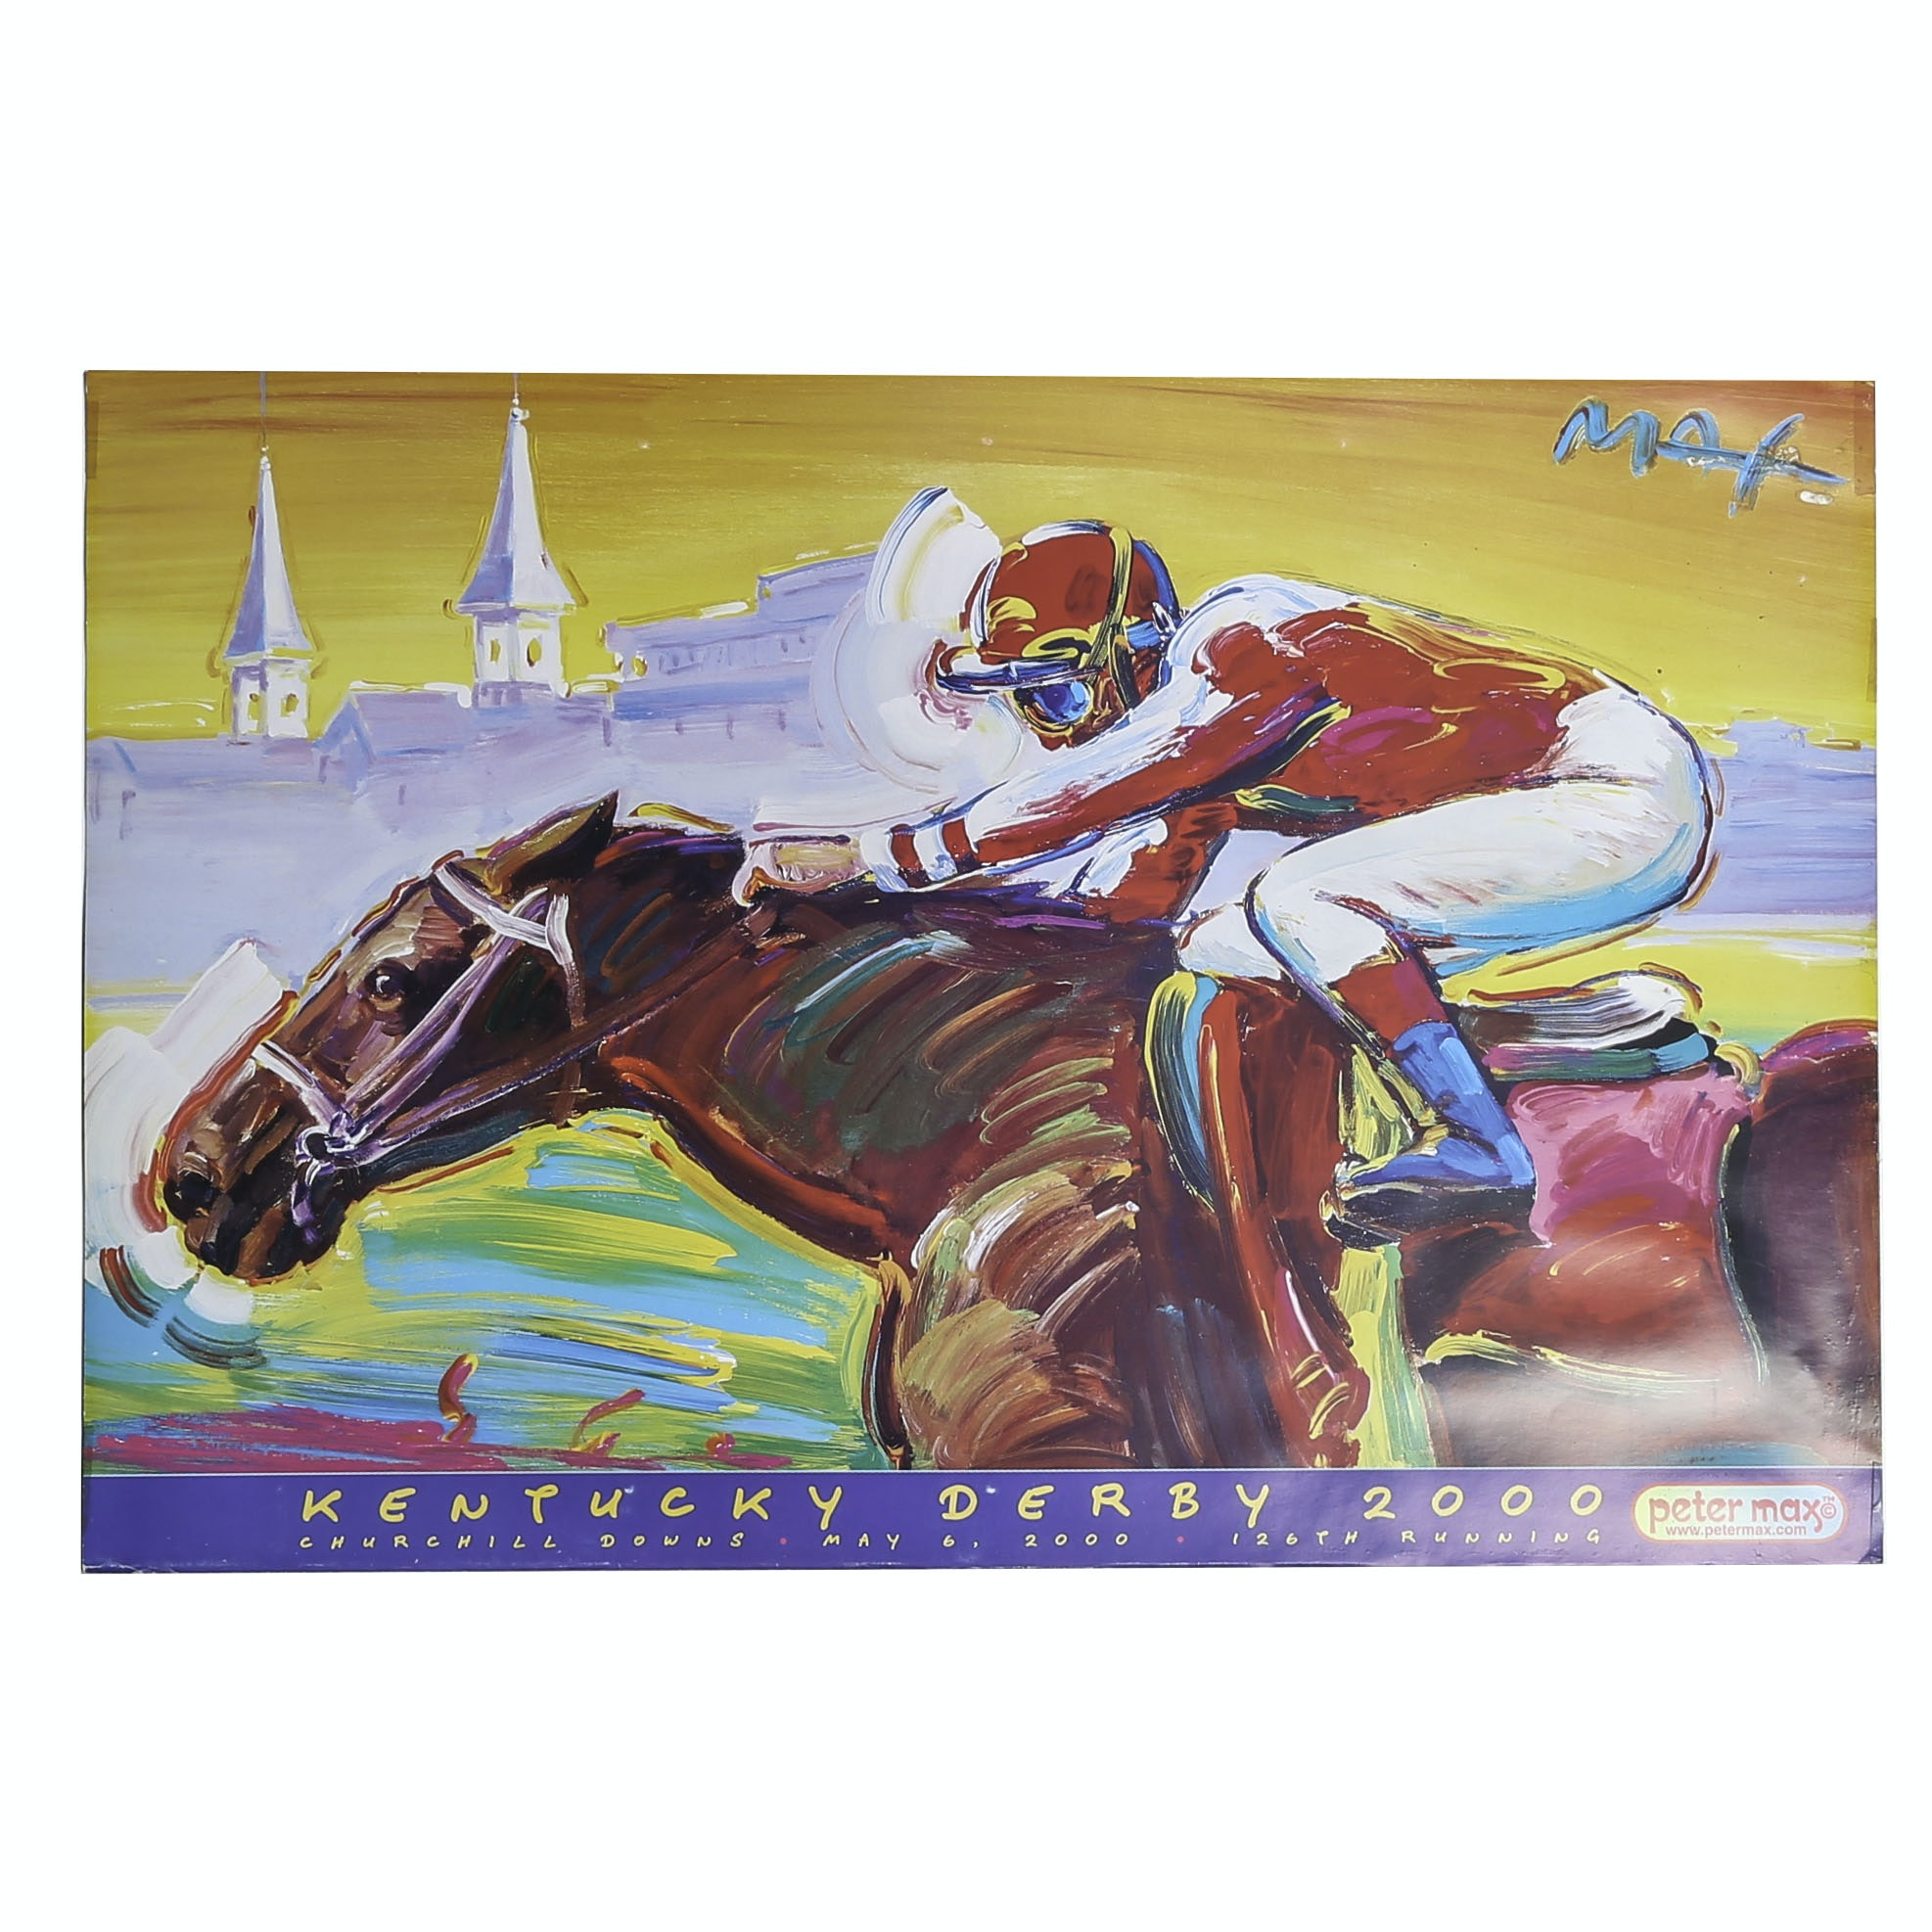 2000 Kentucky Derby Offset Lithograph Poster after Peter Max